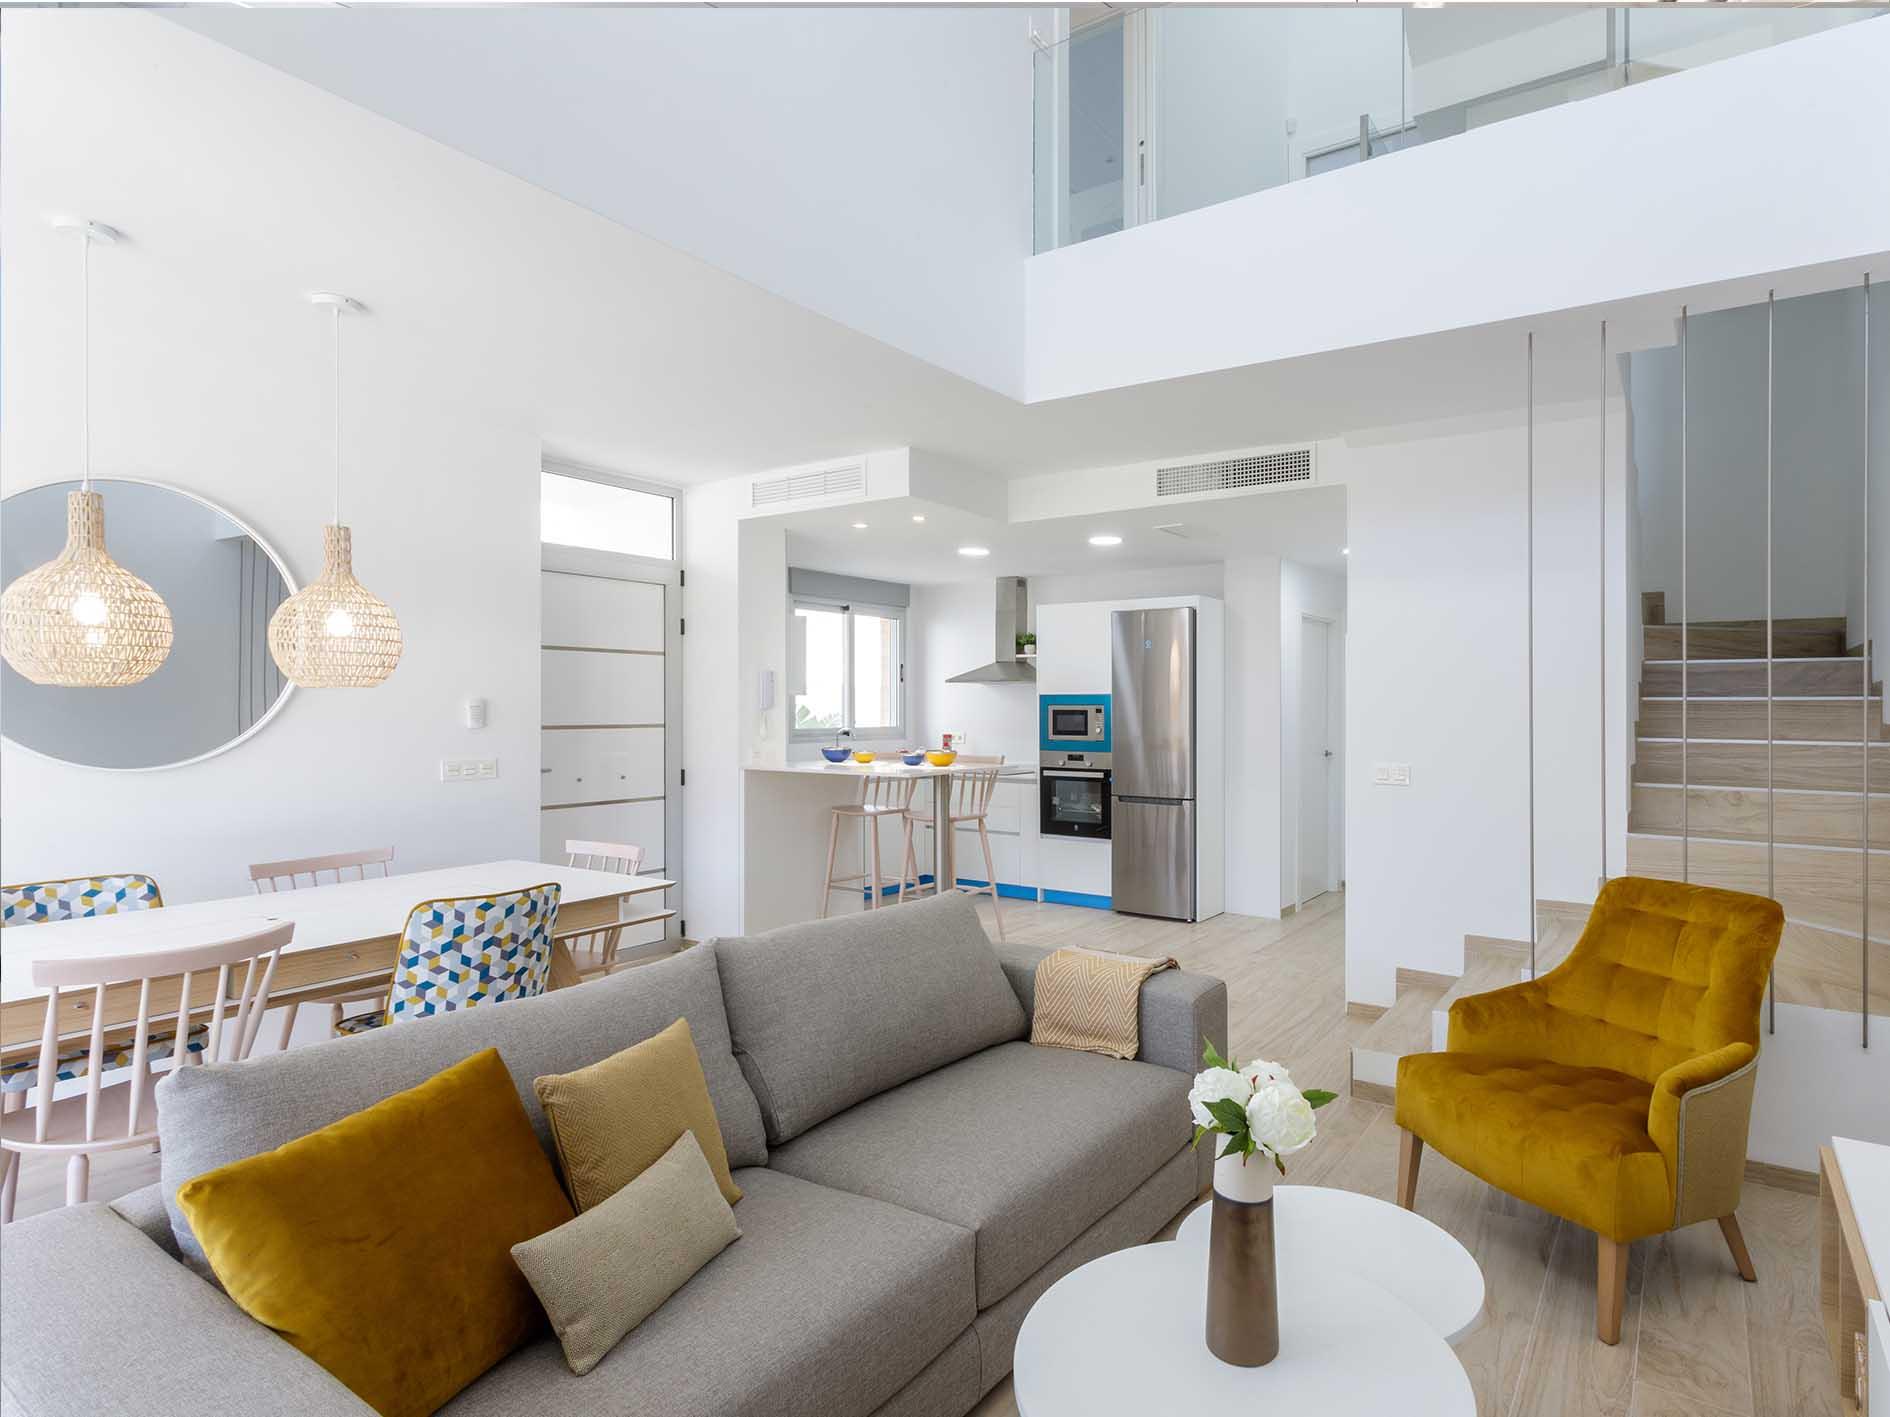 immobilier neuf espagne costa blanca on-d9 el farallon salon